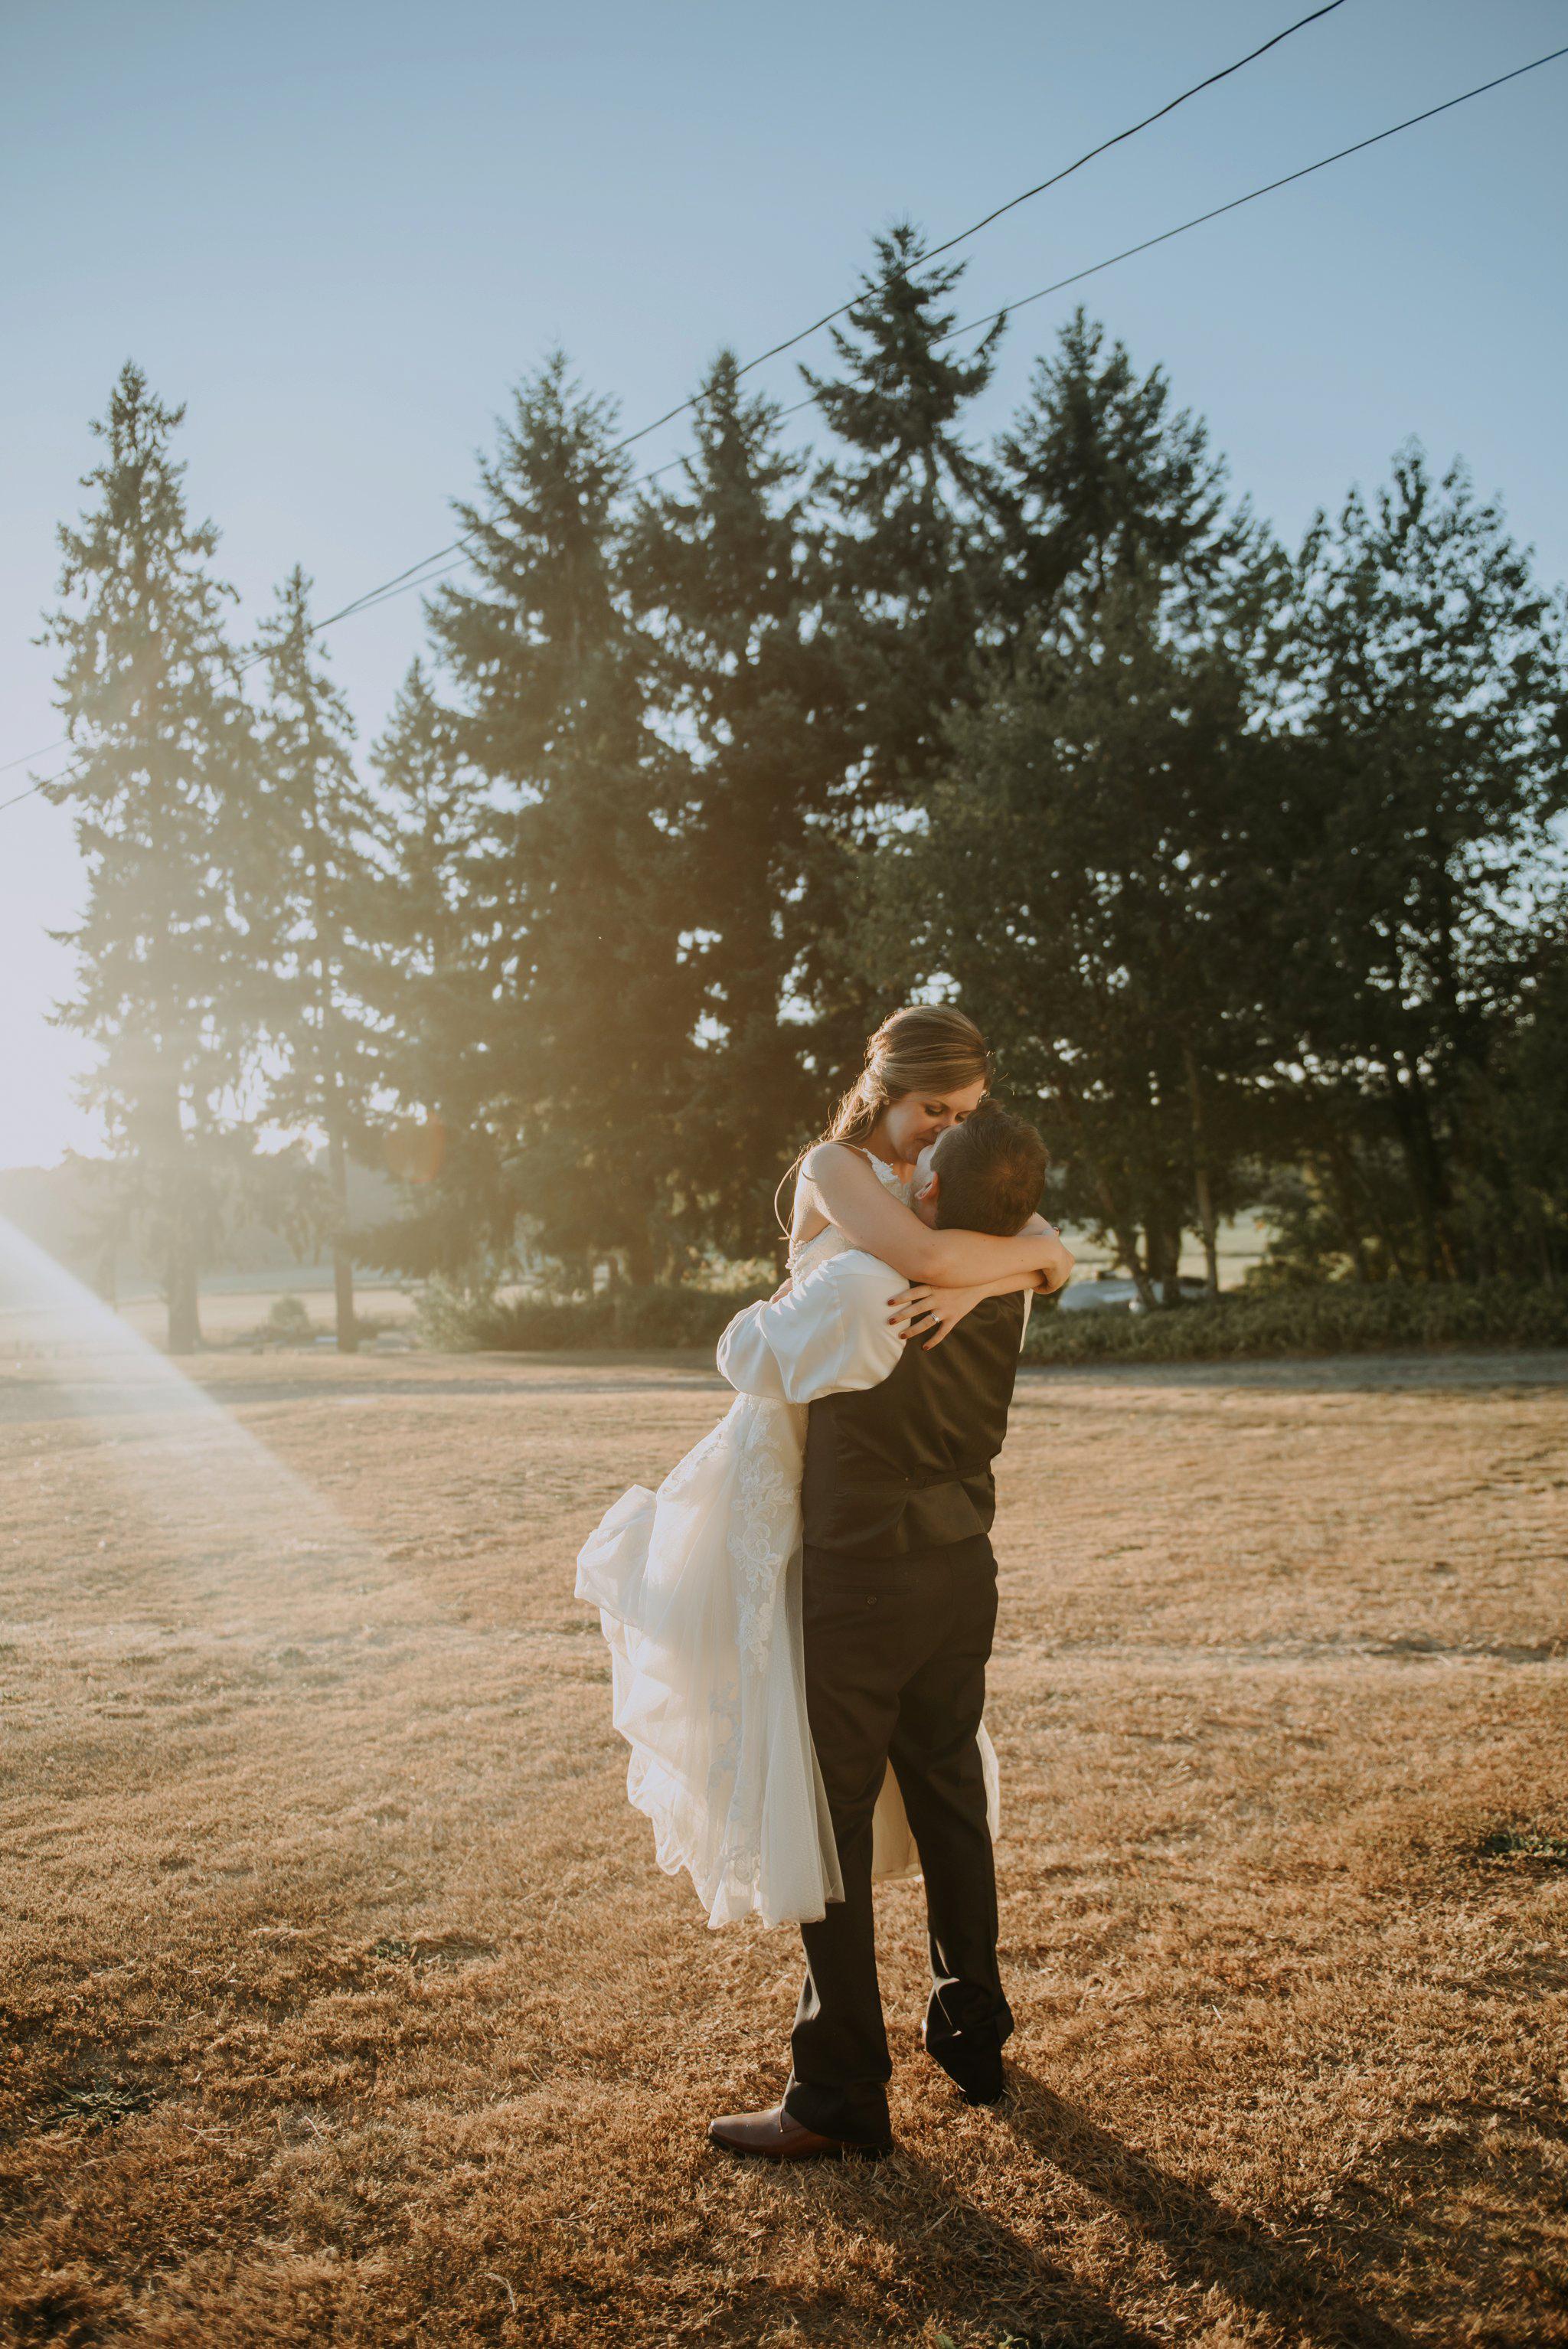 kristen-and-cody-the-kelley-farm-wedding-seattle-photographer-caitlyn-nikula-94.jpg